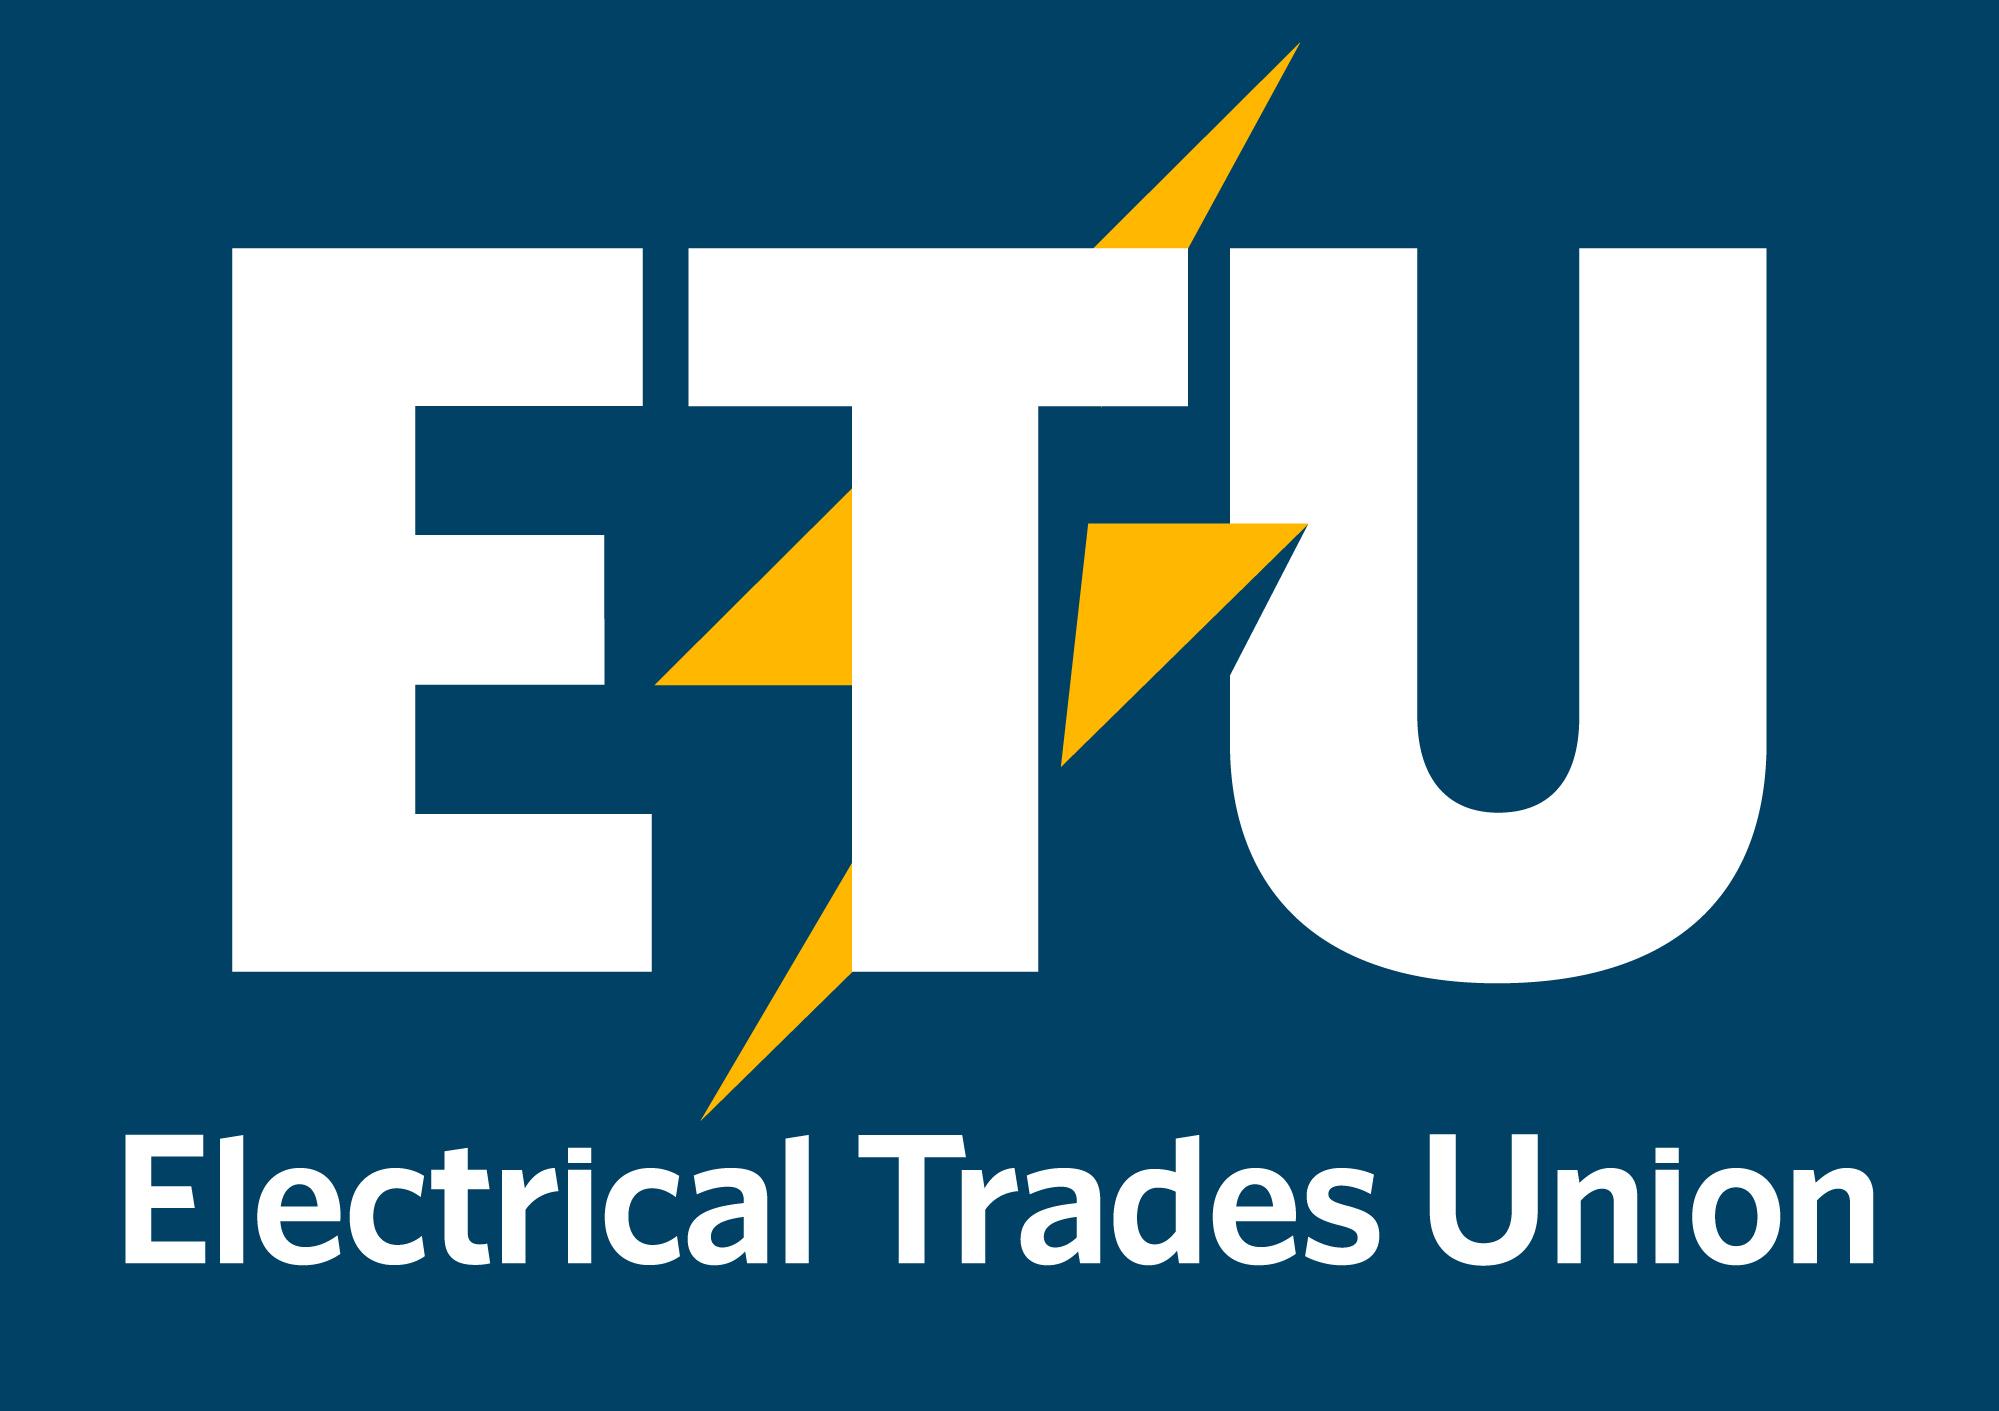 ETU-logo-2012-rgb-300dpi.jpg